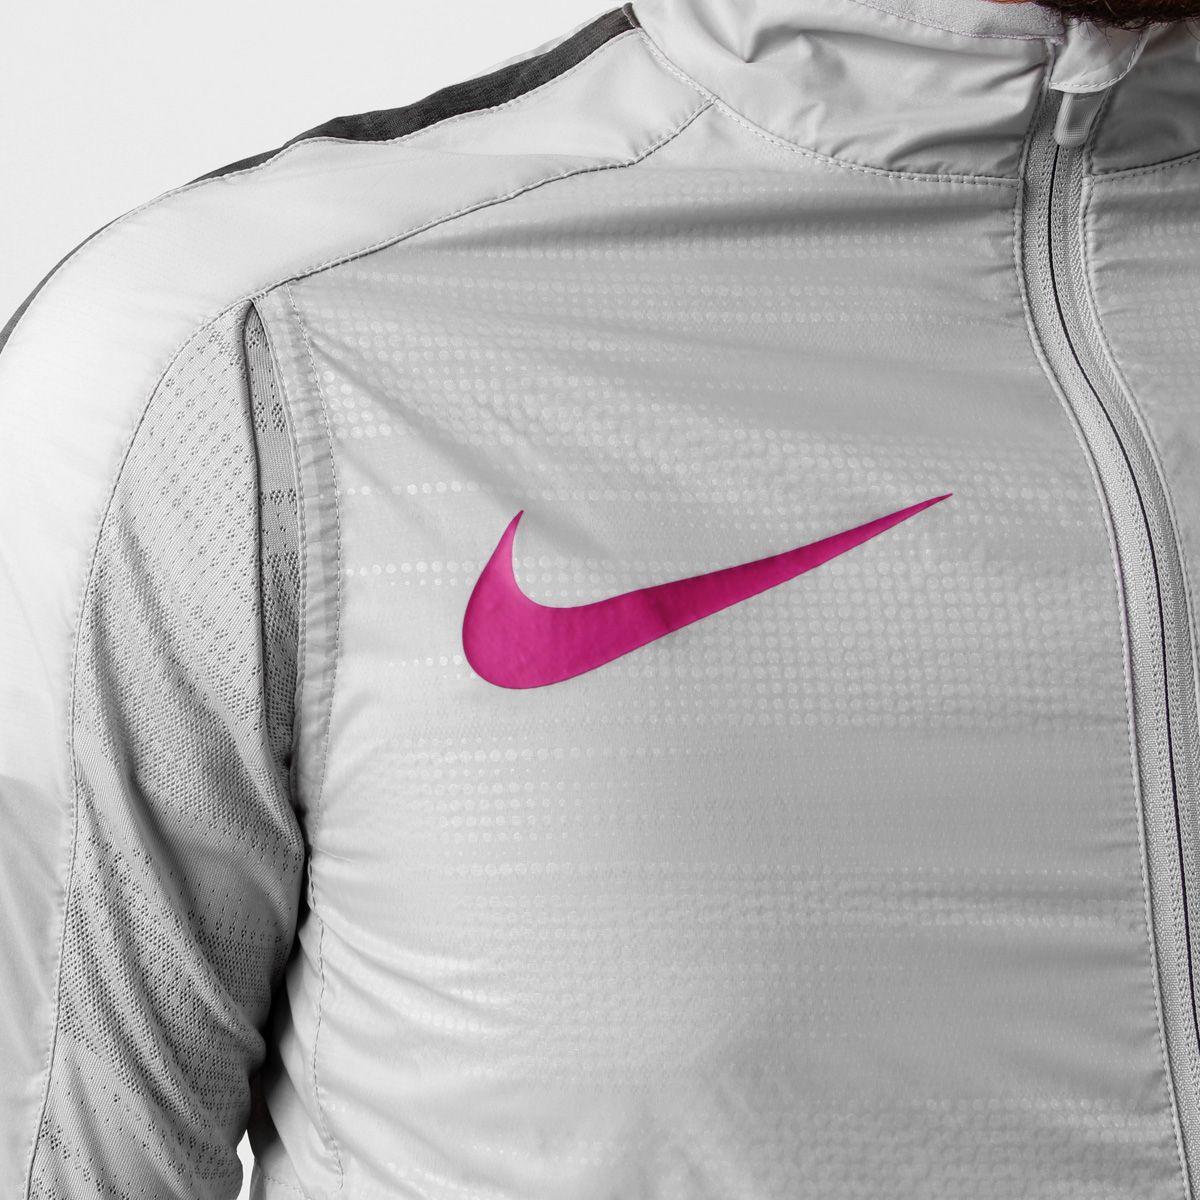 03deef24ace Jaqueta Nike GPX Woven Lightweight Cinza e Violeta